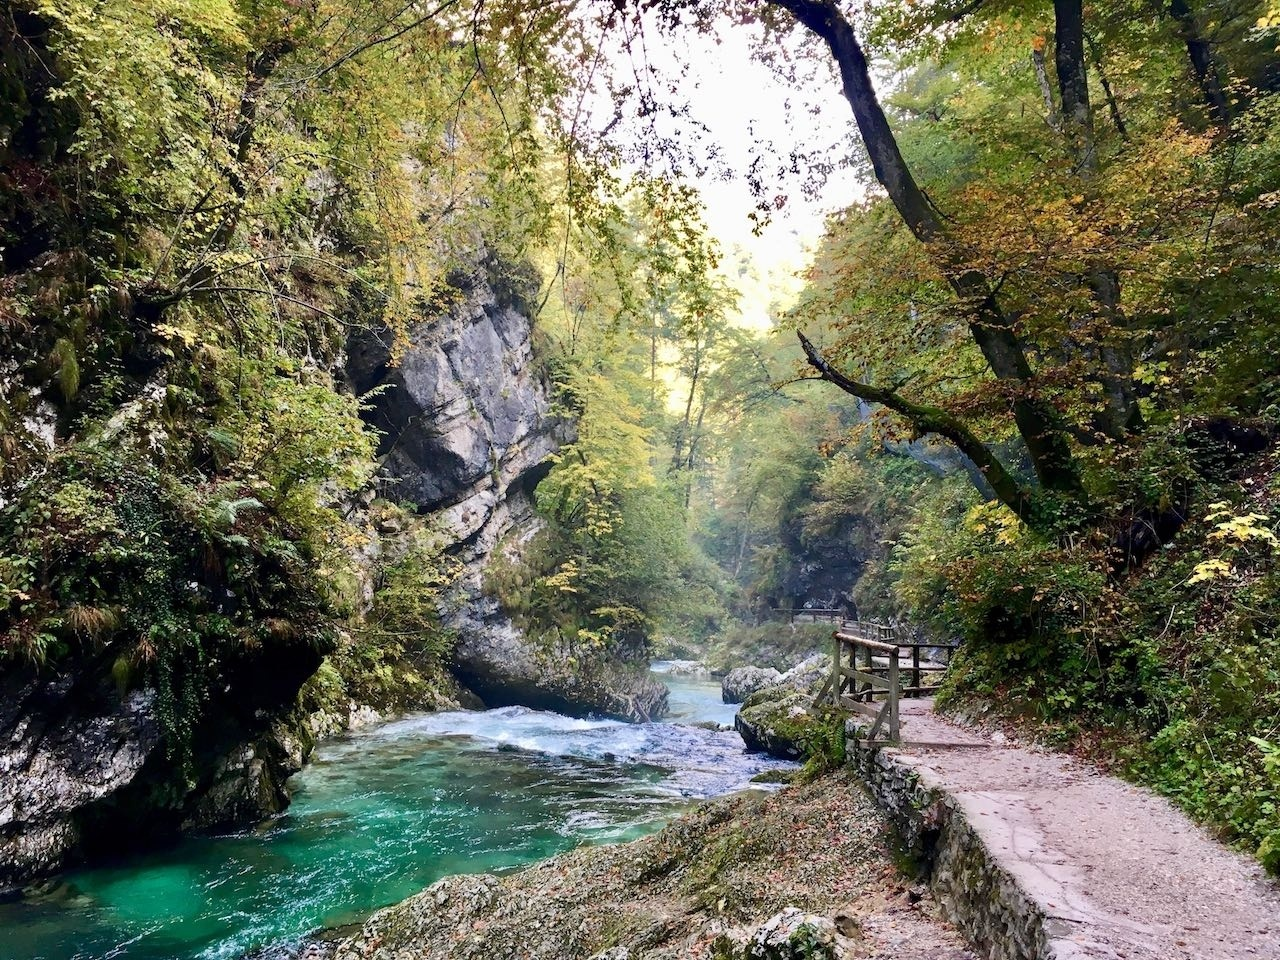 Lake Bled river